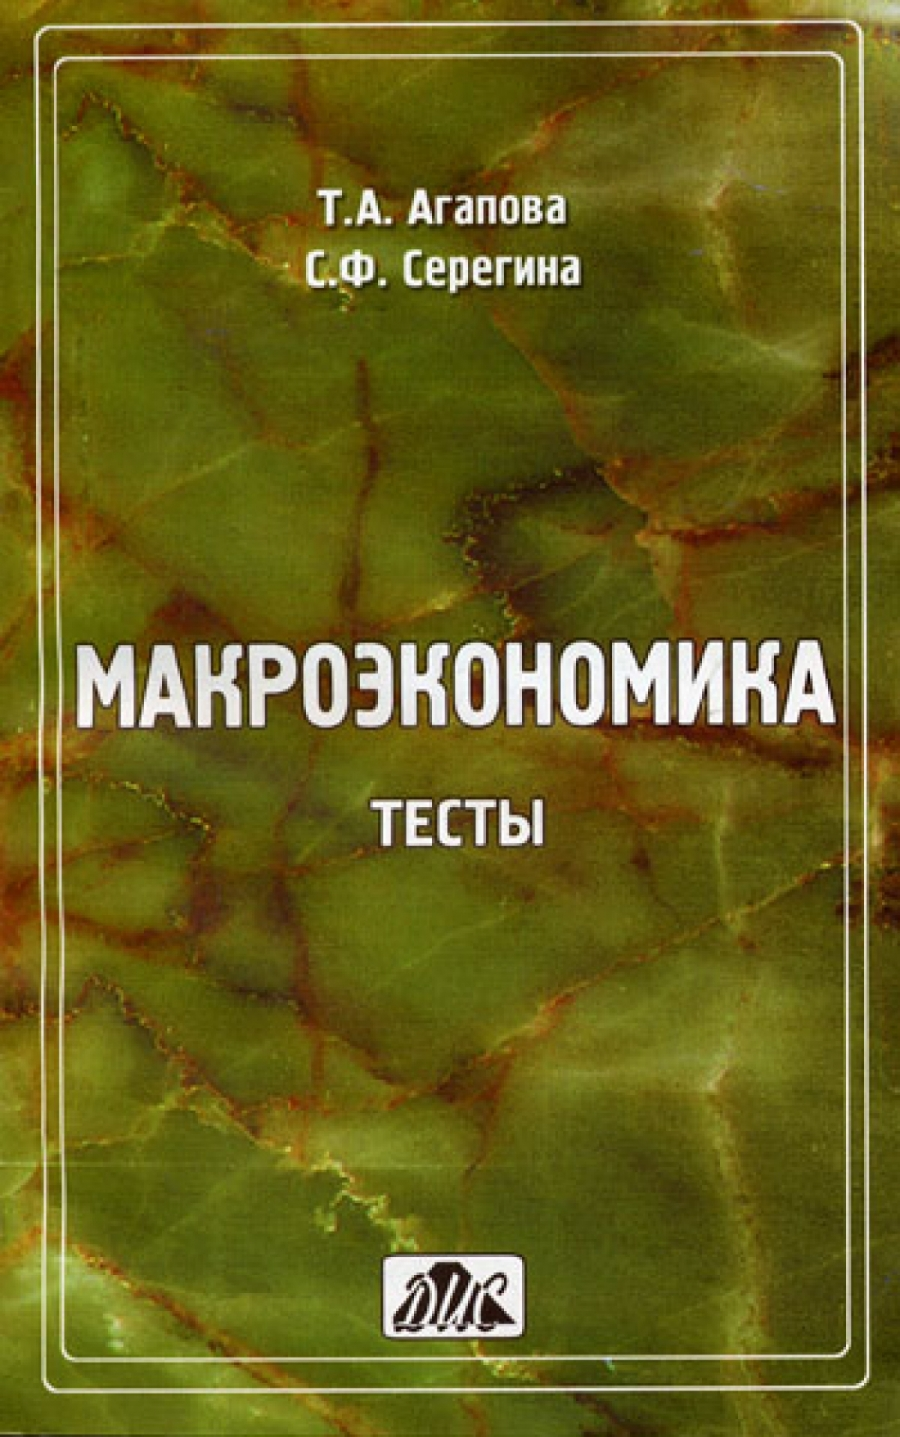 Обложка книги:  агапова т.а., серегина с.ф. - макроэкономика. тесты